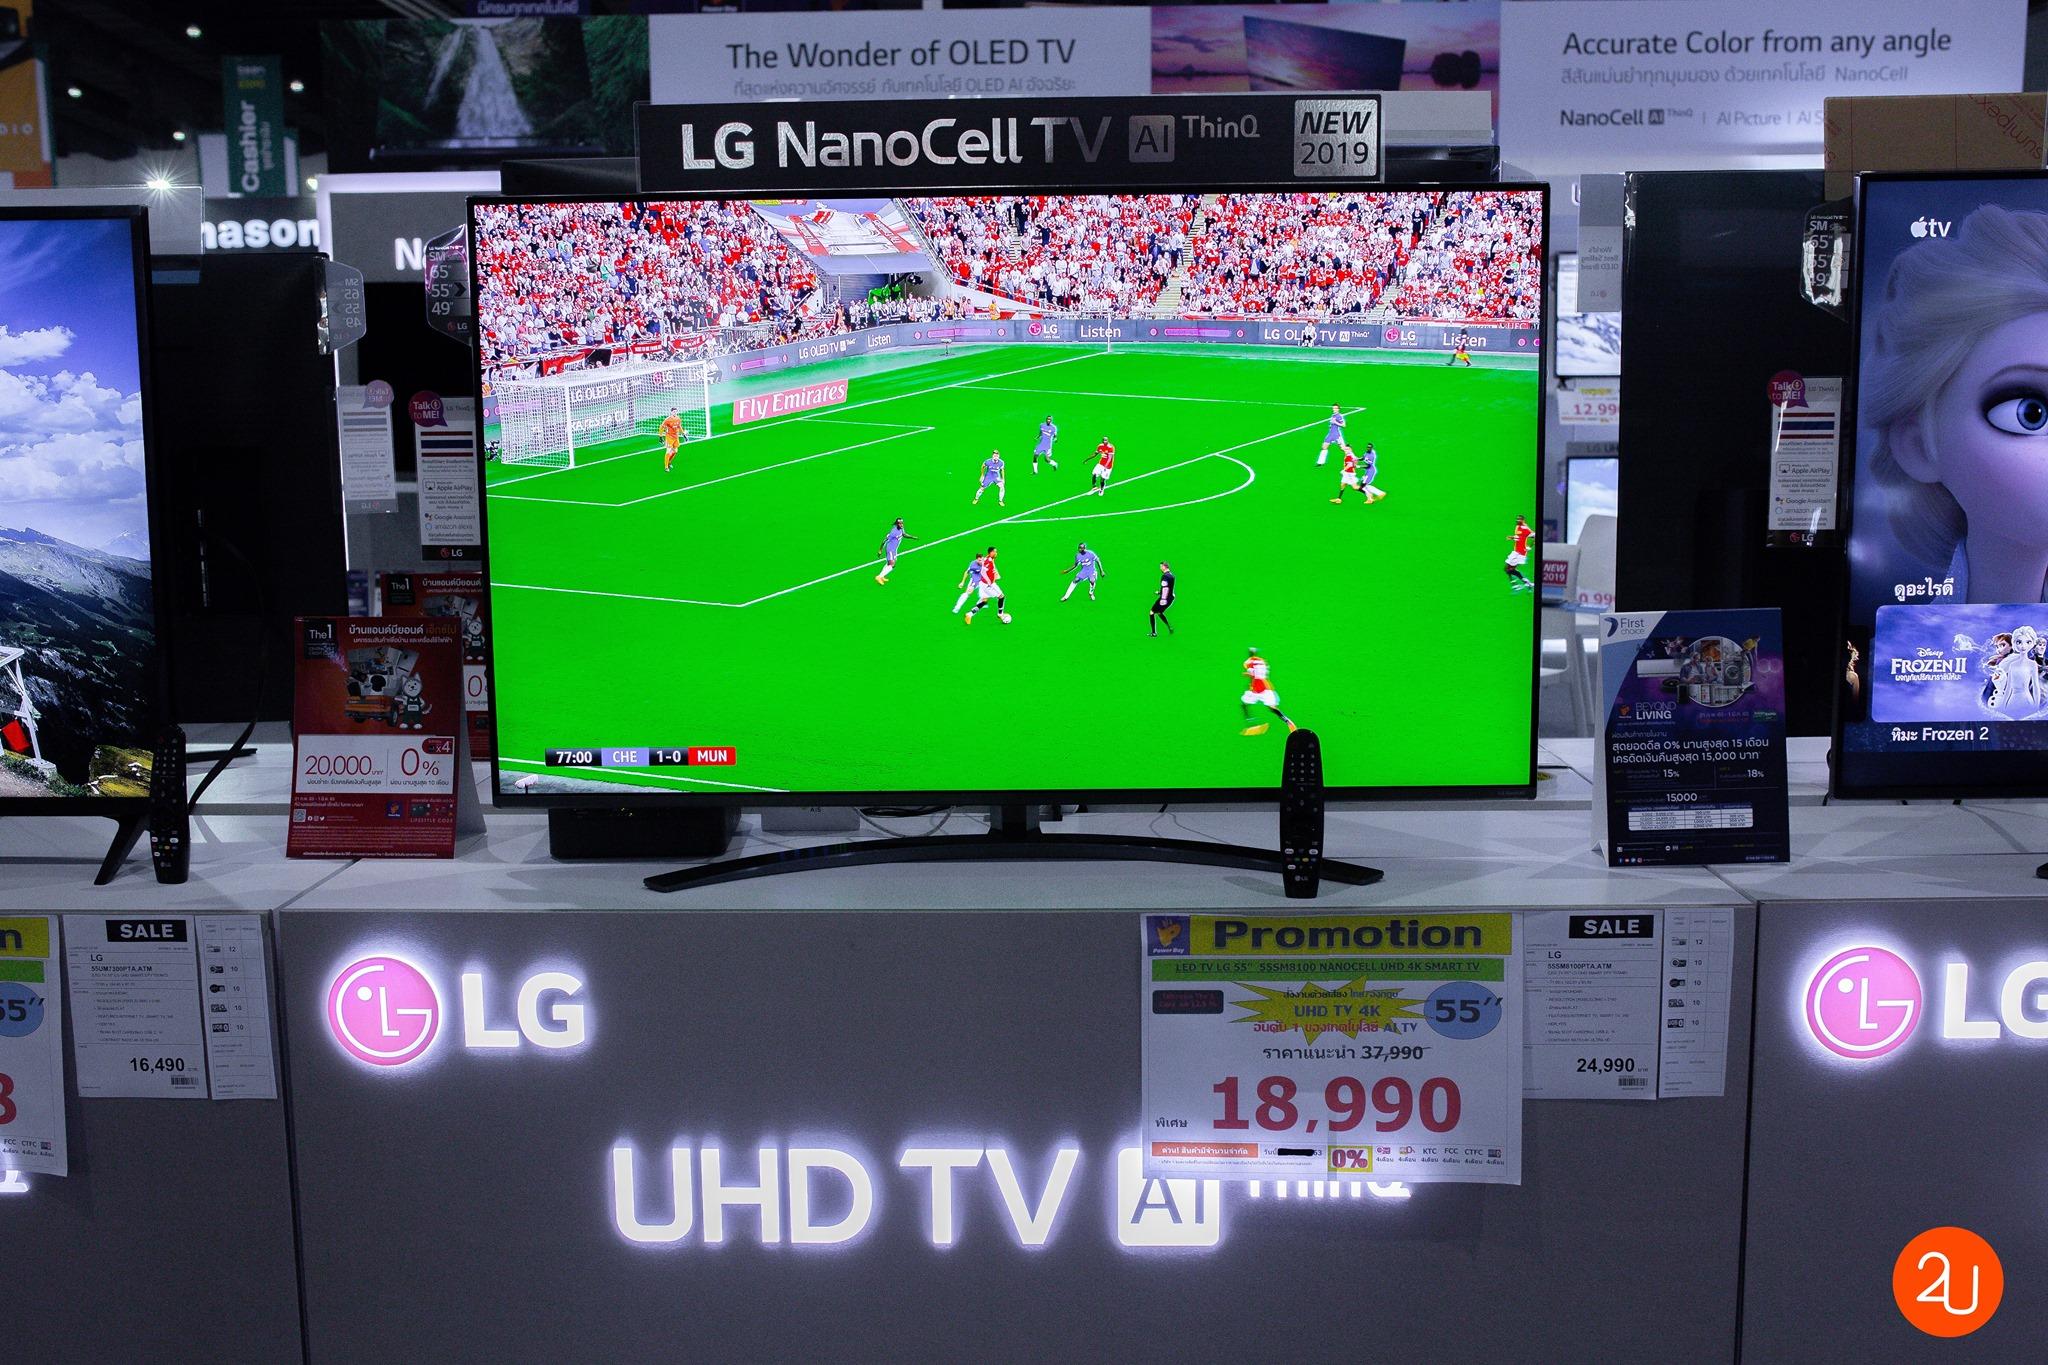 LED TV LG 55 นิ้ว 55SM8100 NANOCELL UHD 4K SMART TV เหลือเพียง 18,990.- (จากปกติ 24,990.-)